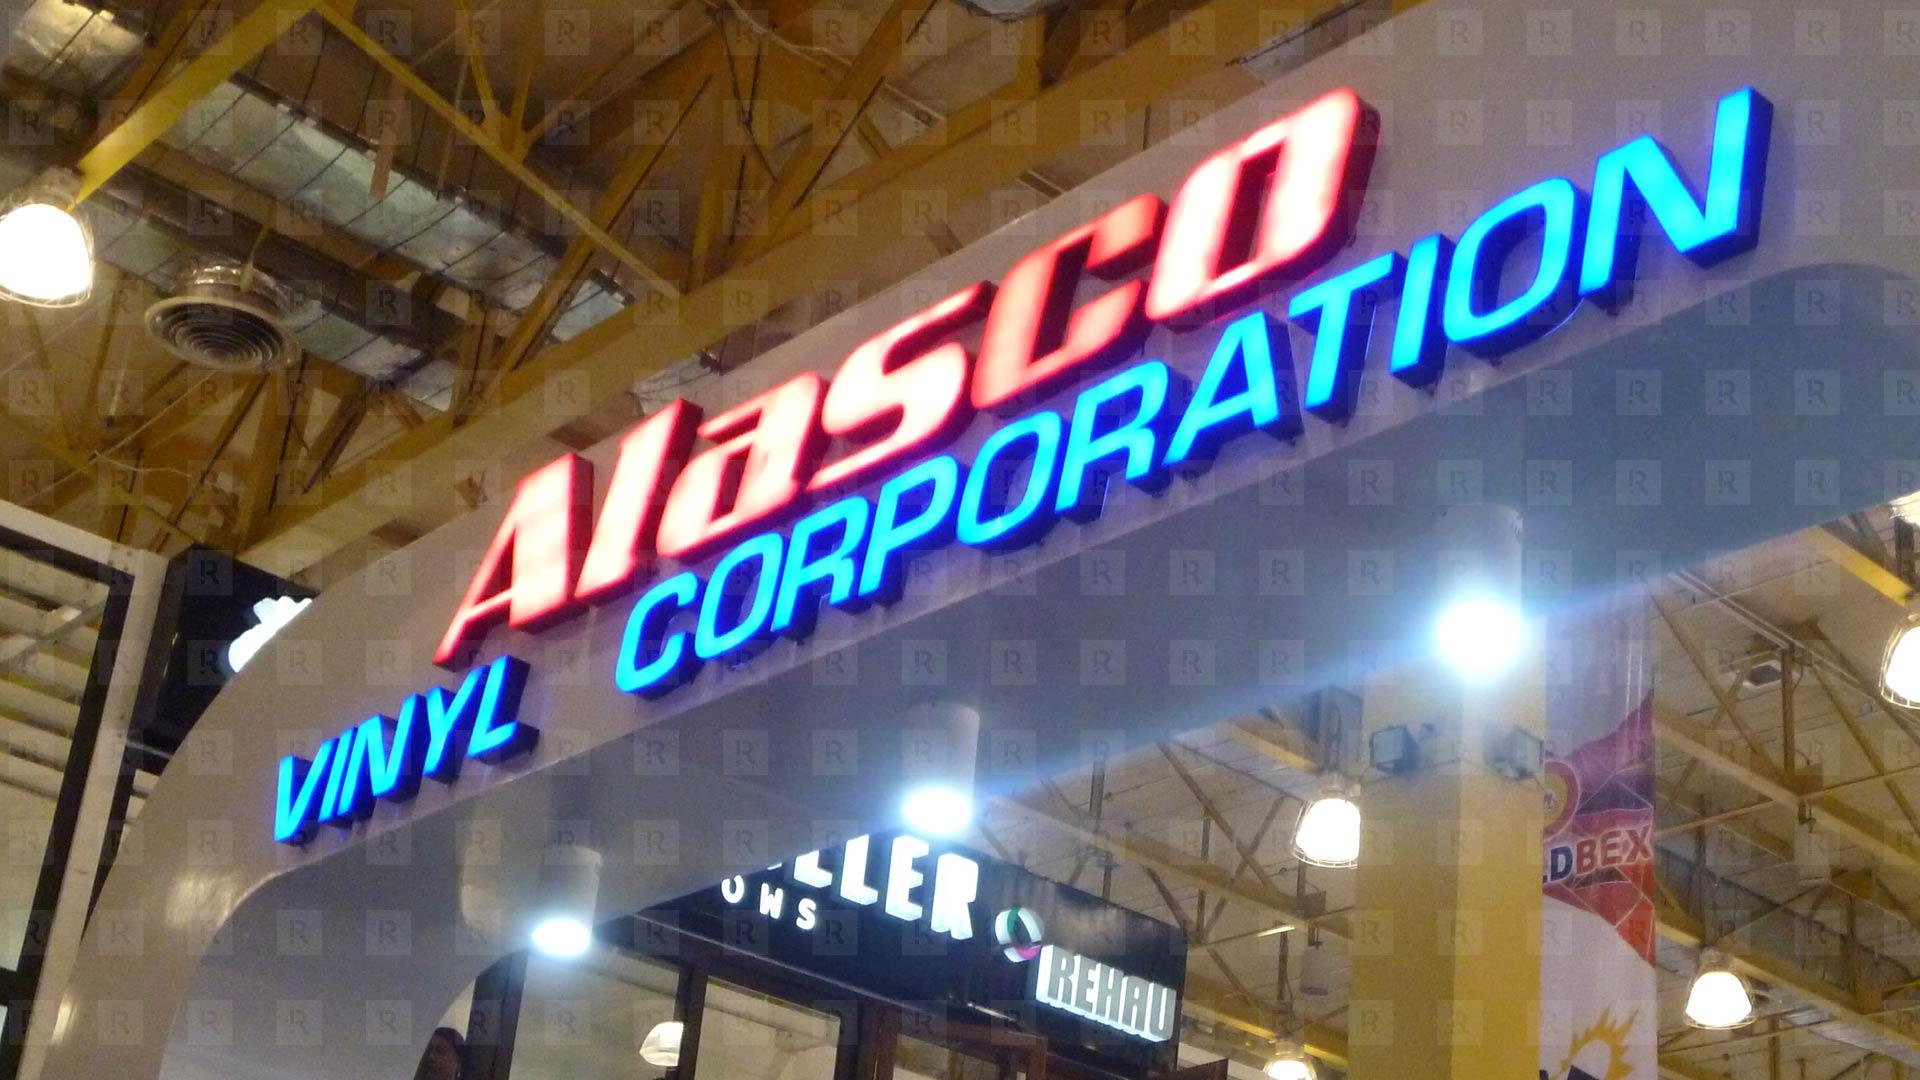 Alasco Booth Worldbex